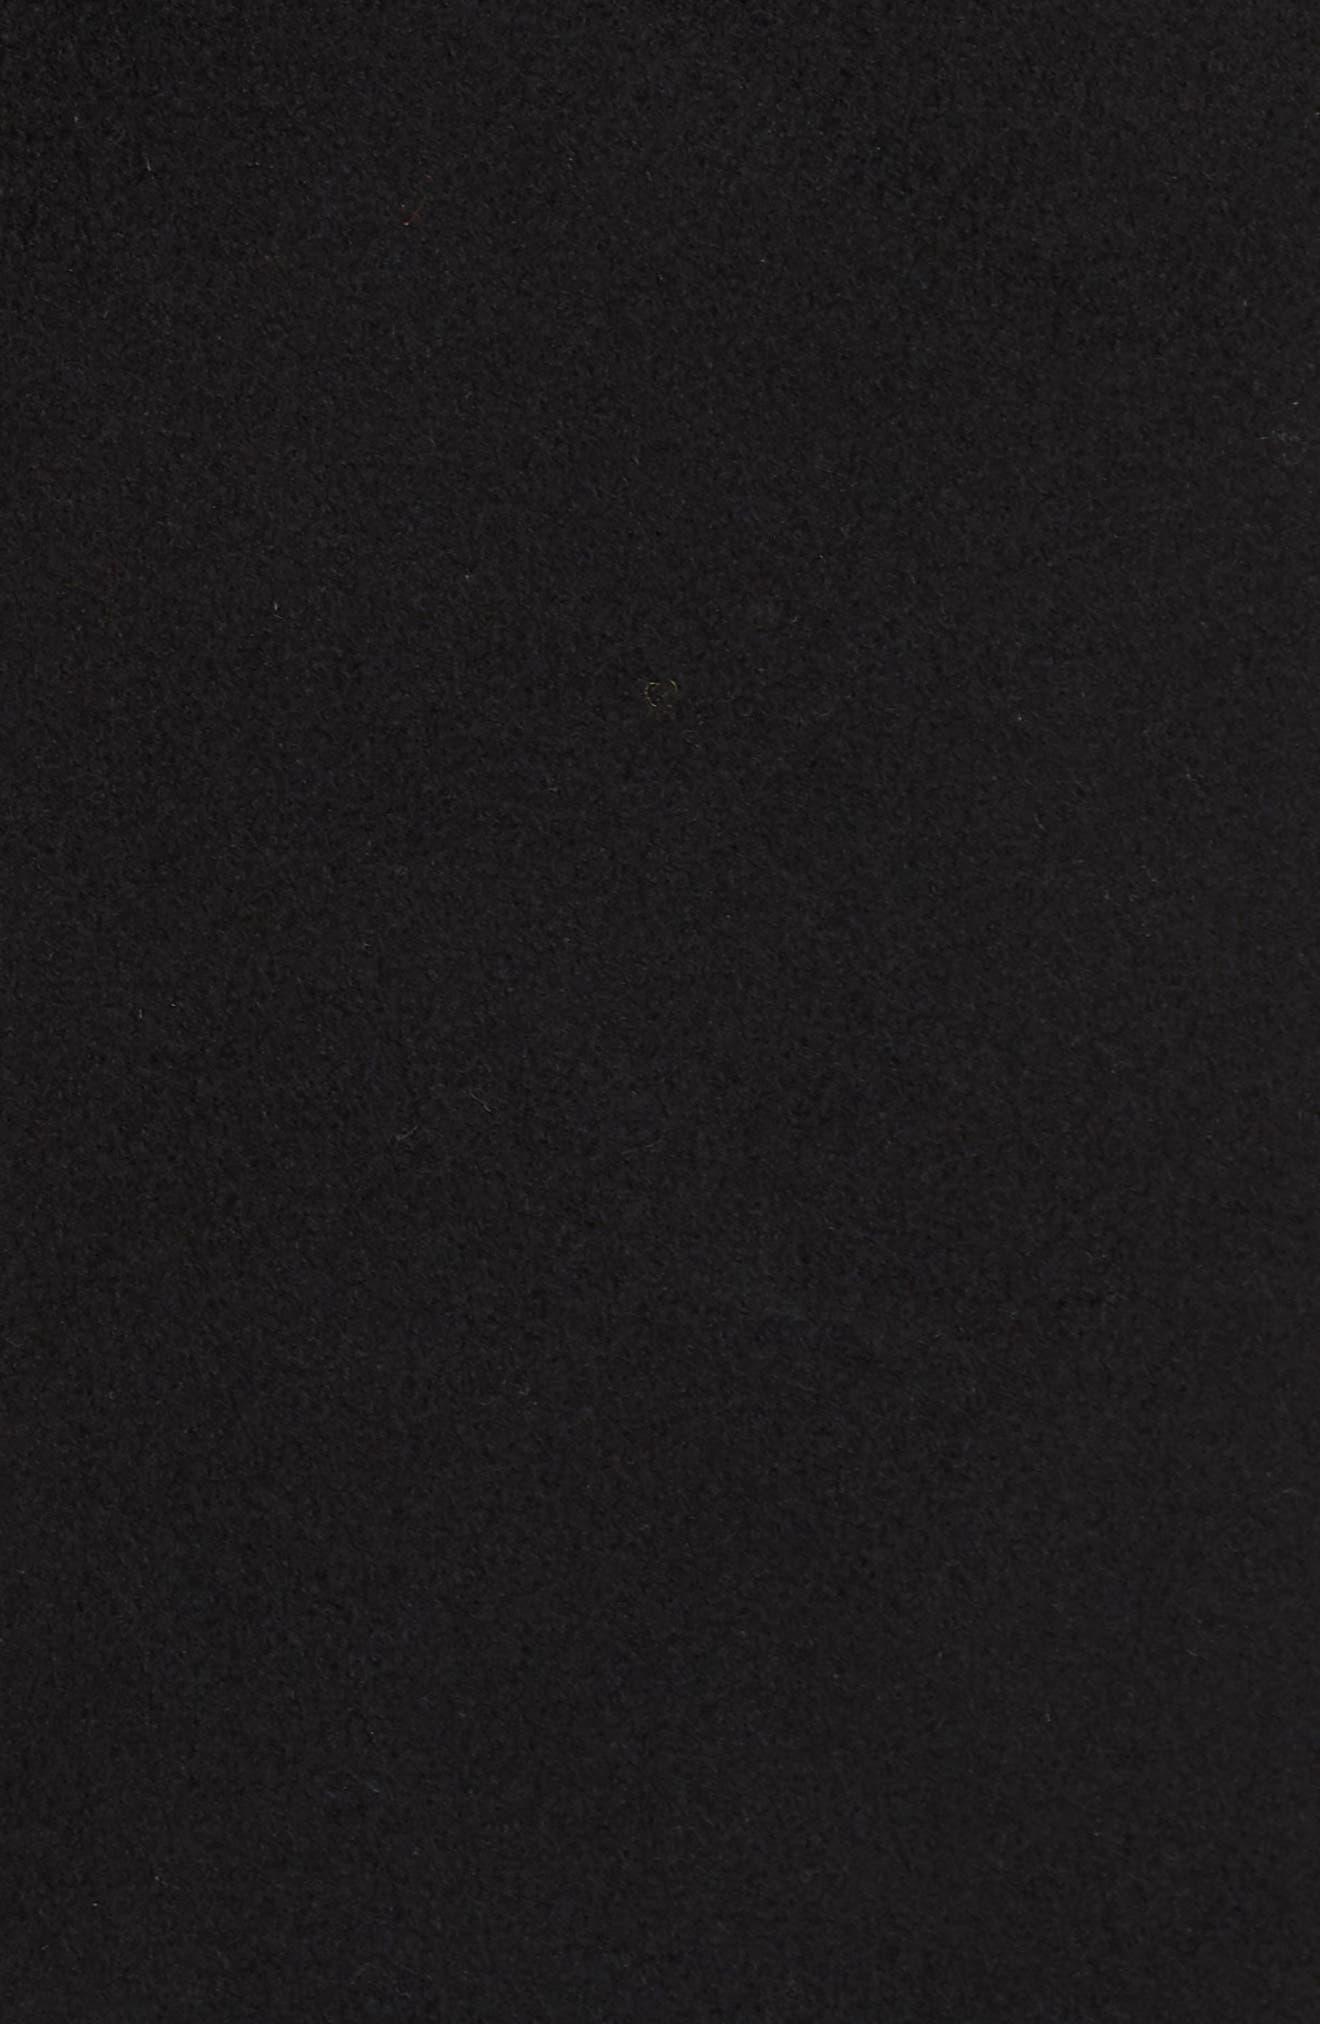 FLEURETTE, Notch Collar Loro Piana Wool Coat, Alternate thumbnail 7, color, BLACK